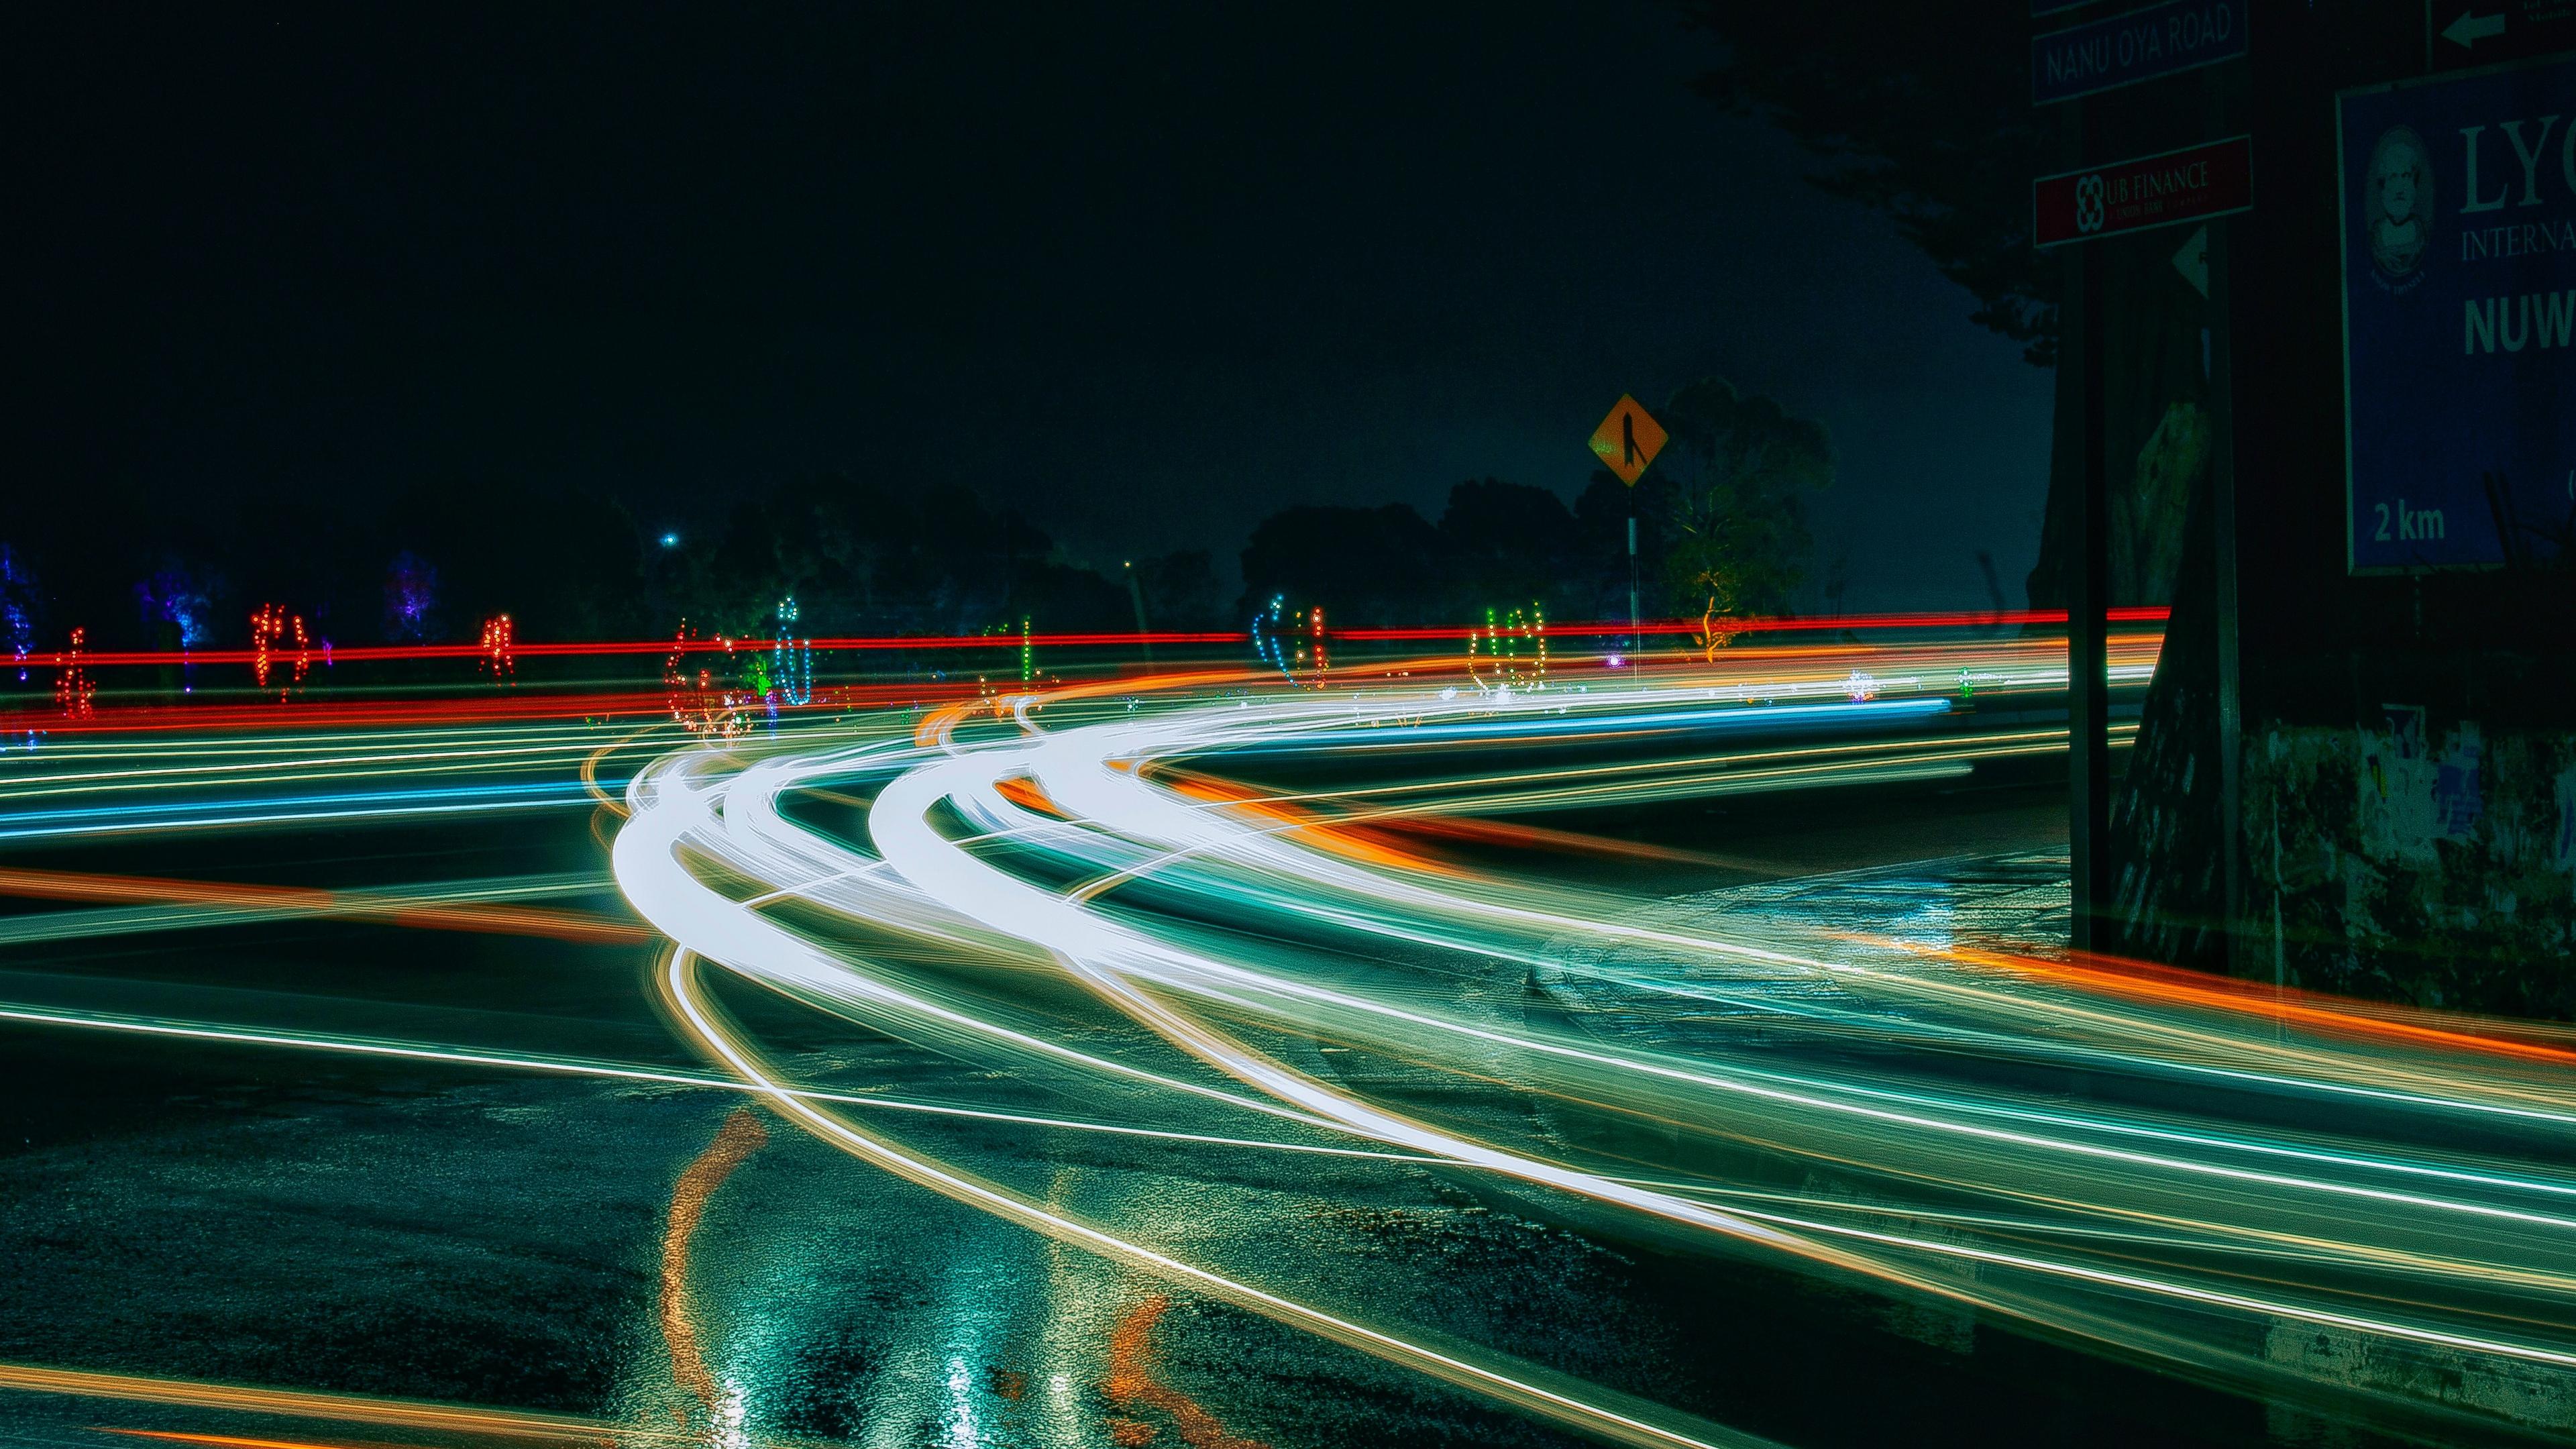 turn light road night 4k 1538066594 - turn, light, road, night 4k - turn, Road, Light